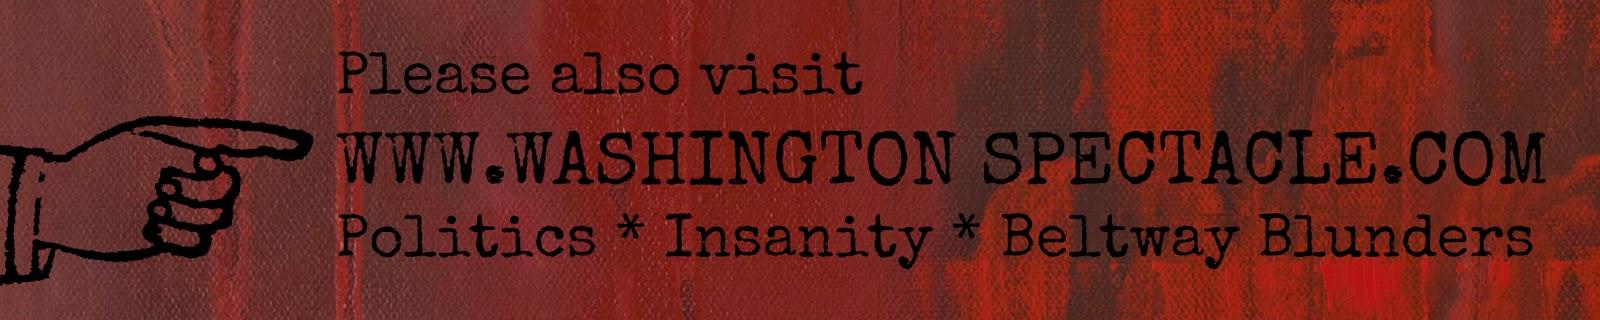 www.washingtonspectacle.com